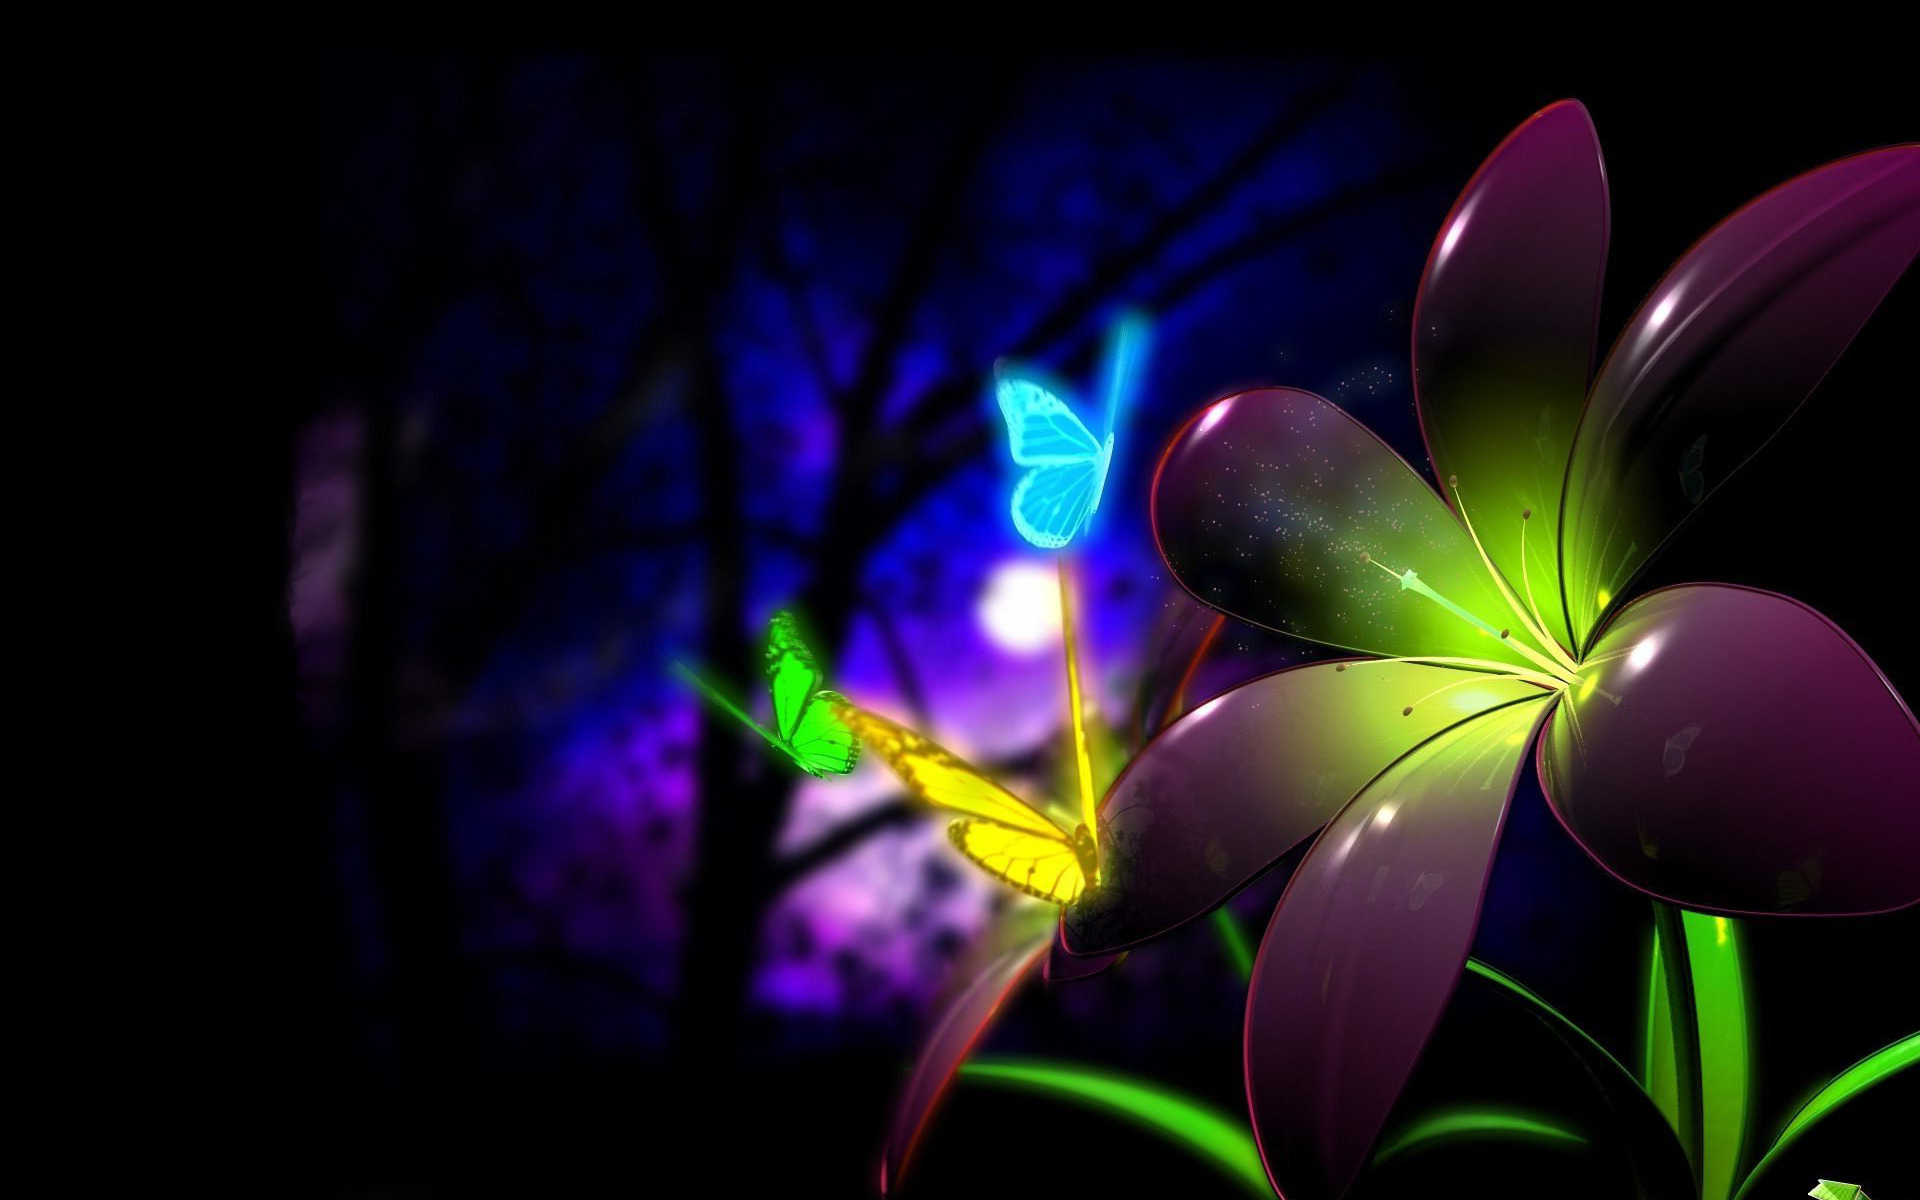 Chidas Para Fondo De Escritorio 3d: Neon Butterflies Full HD Wallpaper And Background Image